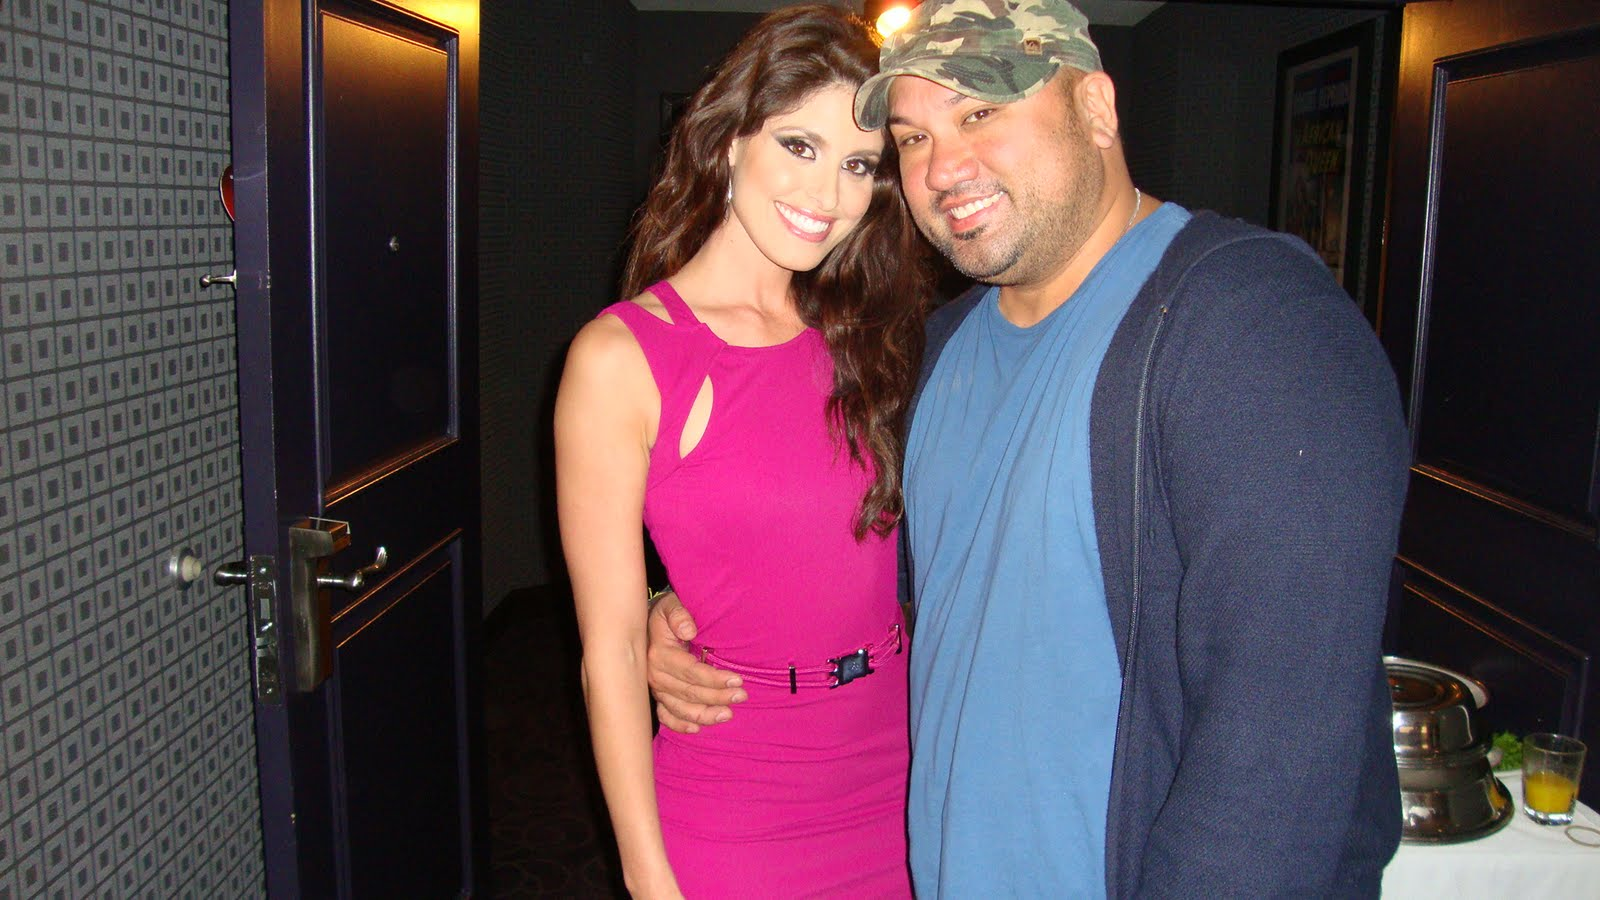 Miss Florida USA 2010 - Megan Clementi DSC01545